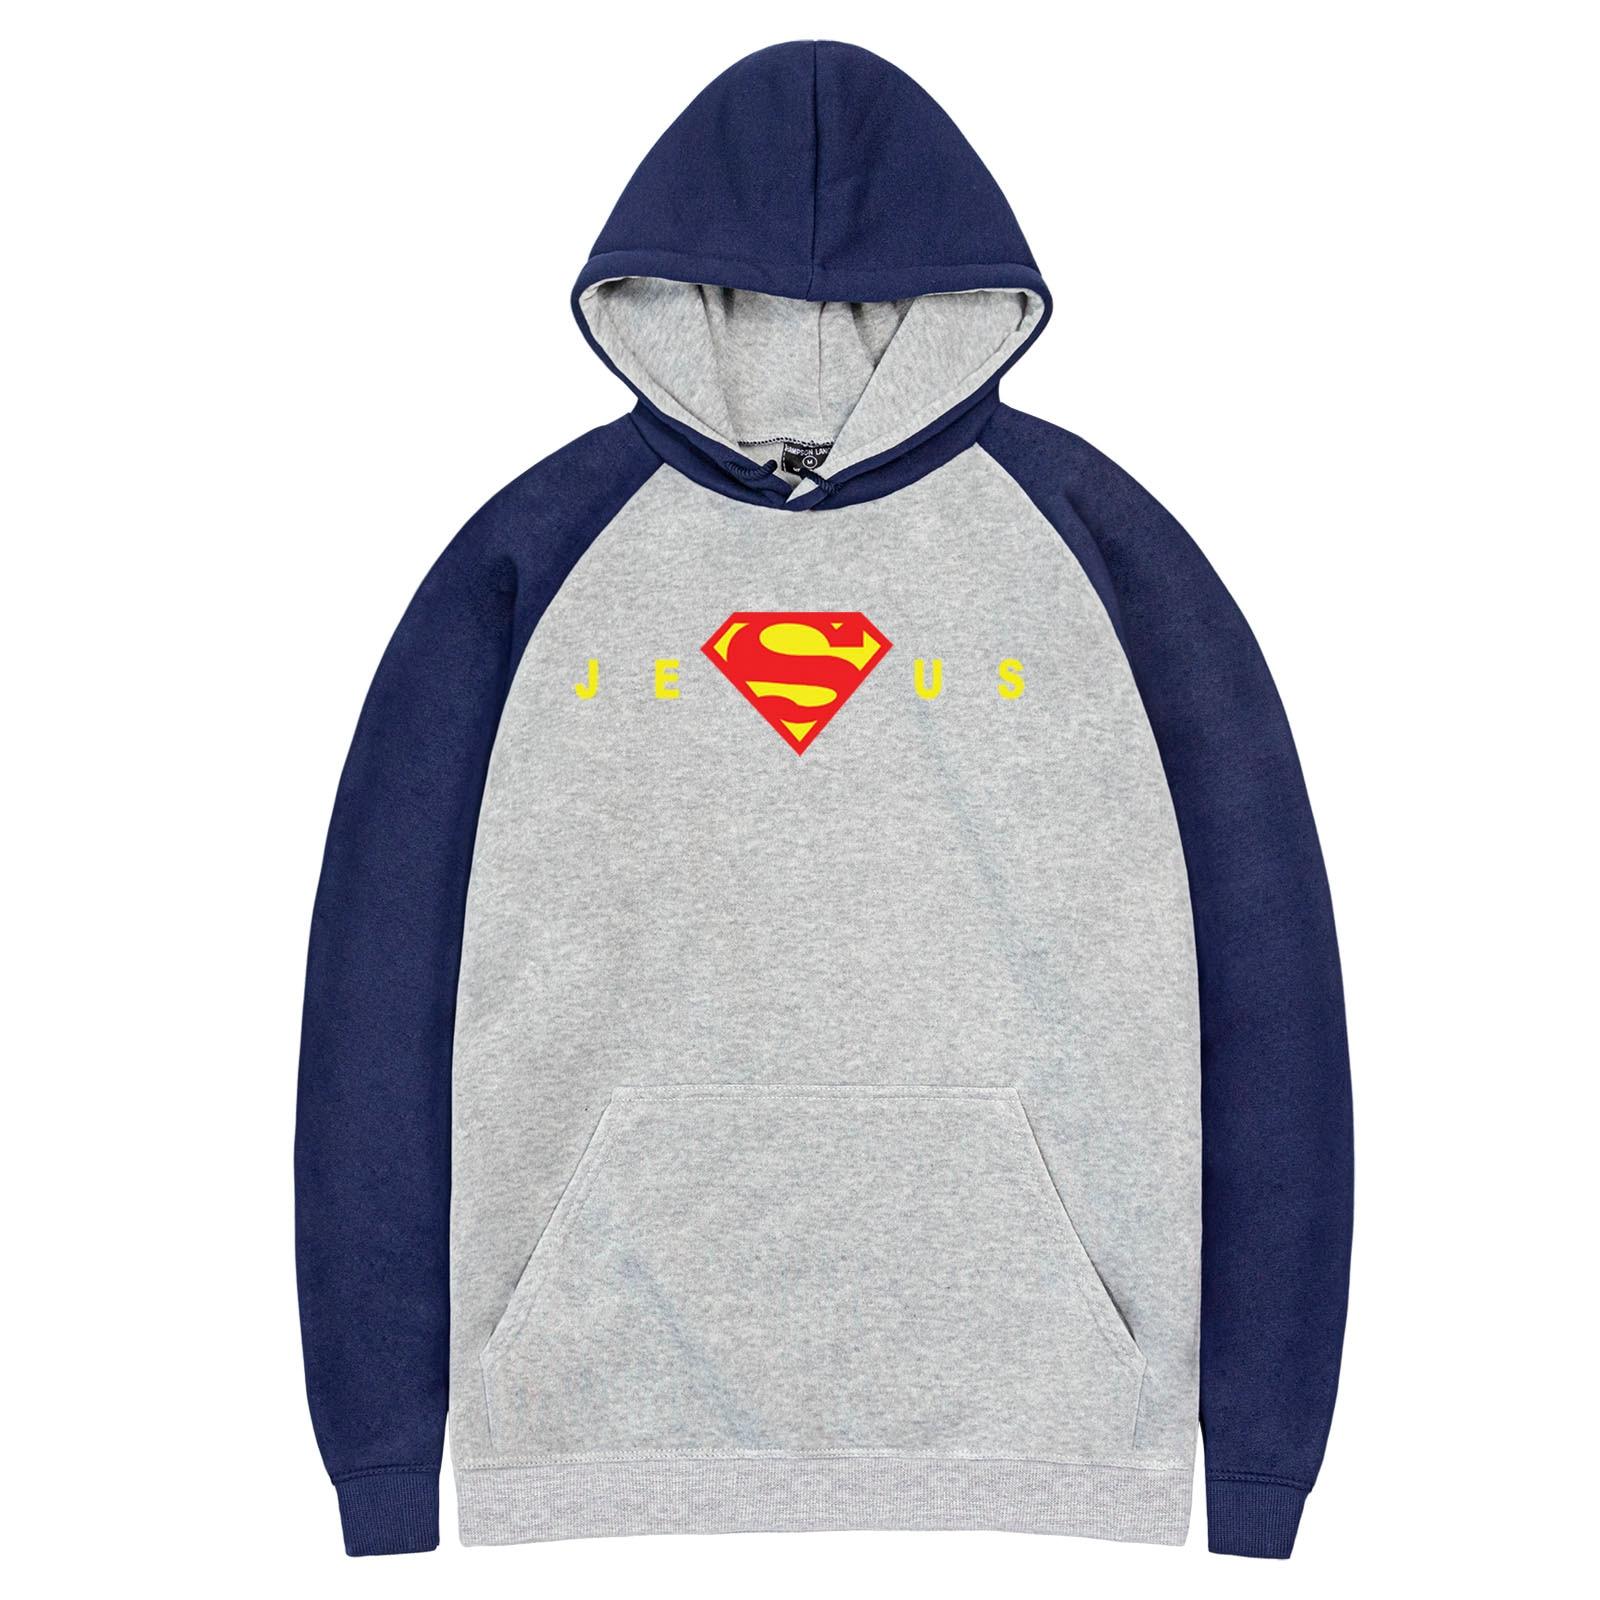 JESUE Supreman Spring Autumn New Arrival Pullover Casual Fleece Warm Raglan Hoodies Hot Selling Man Hoodie Hip Hop Sweatshirts